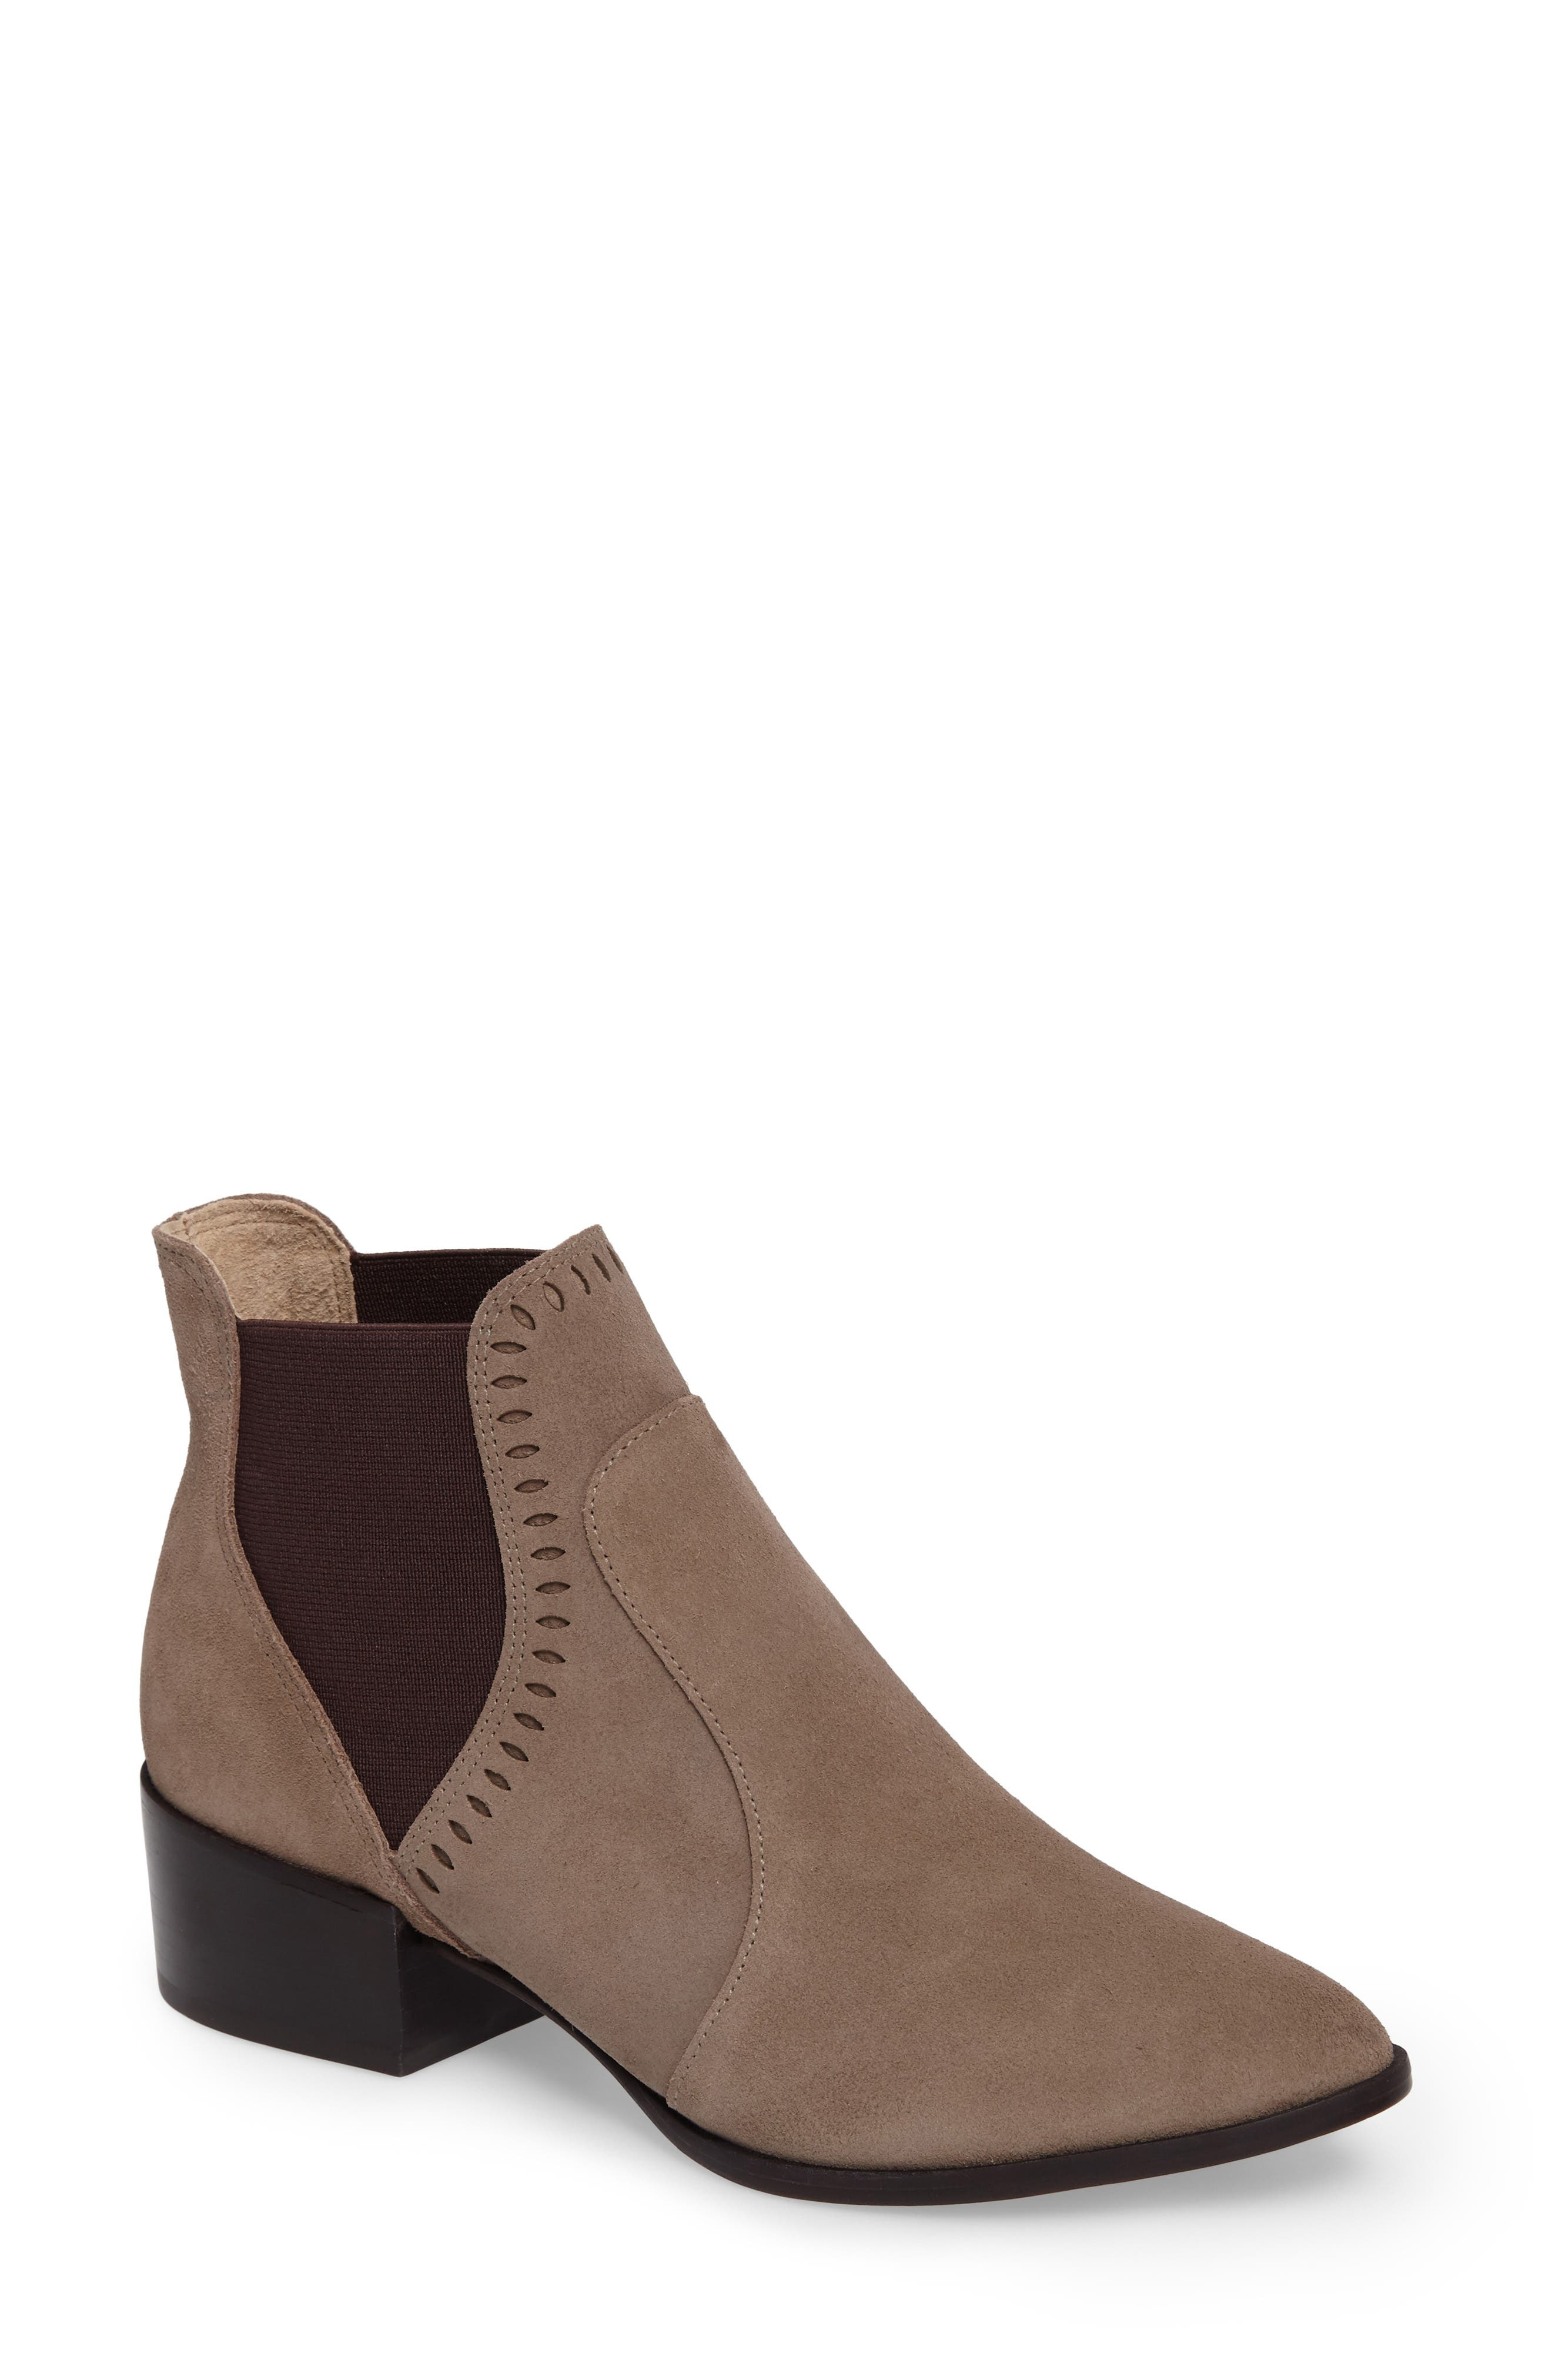 Zafira Chelsea Boot,                         Main,                         color,